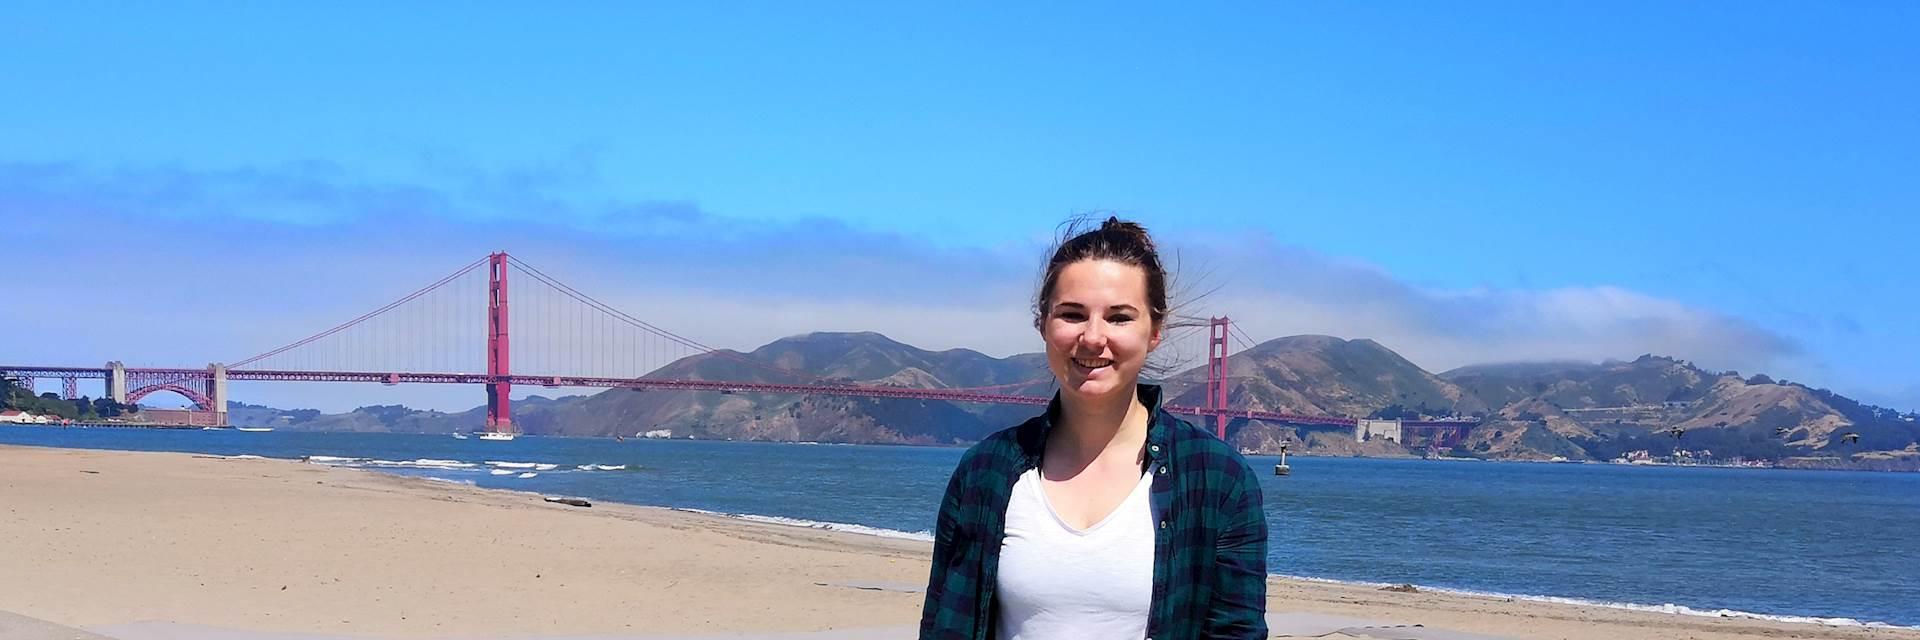 Meg in San Francisco